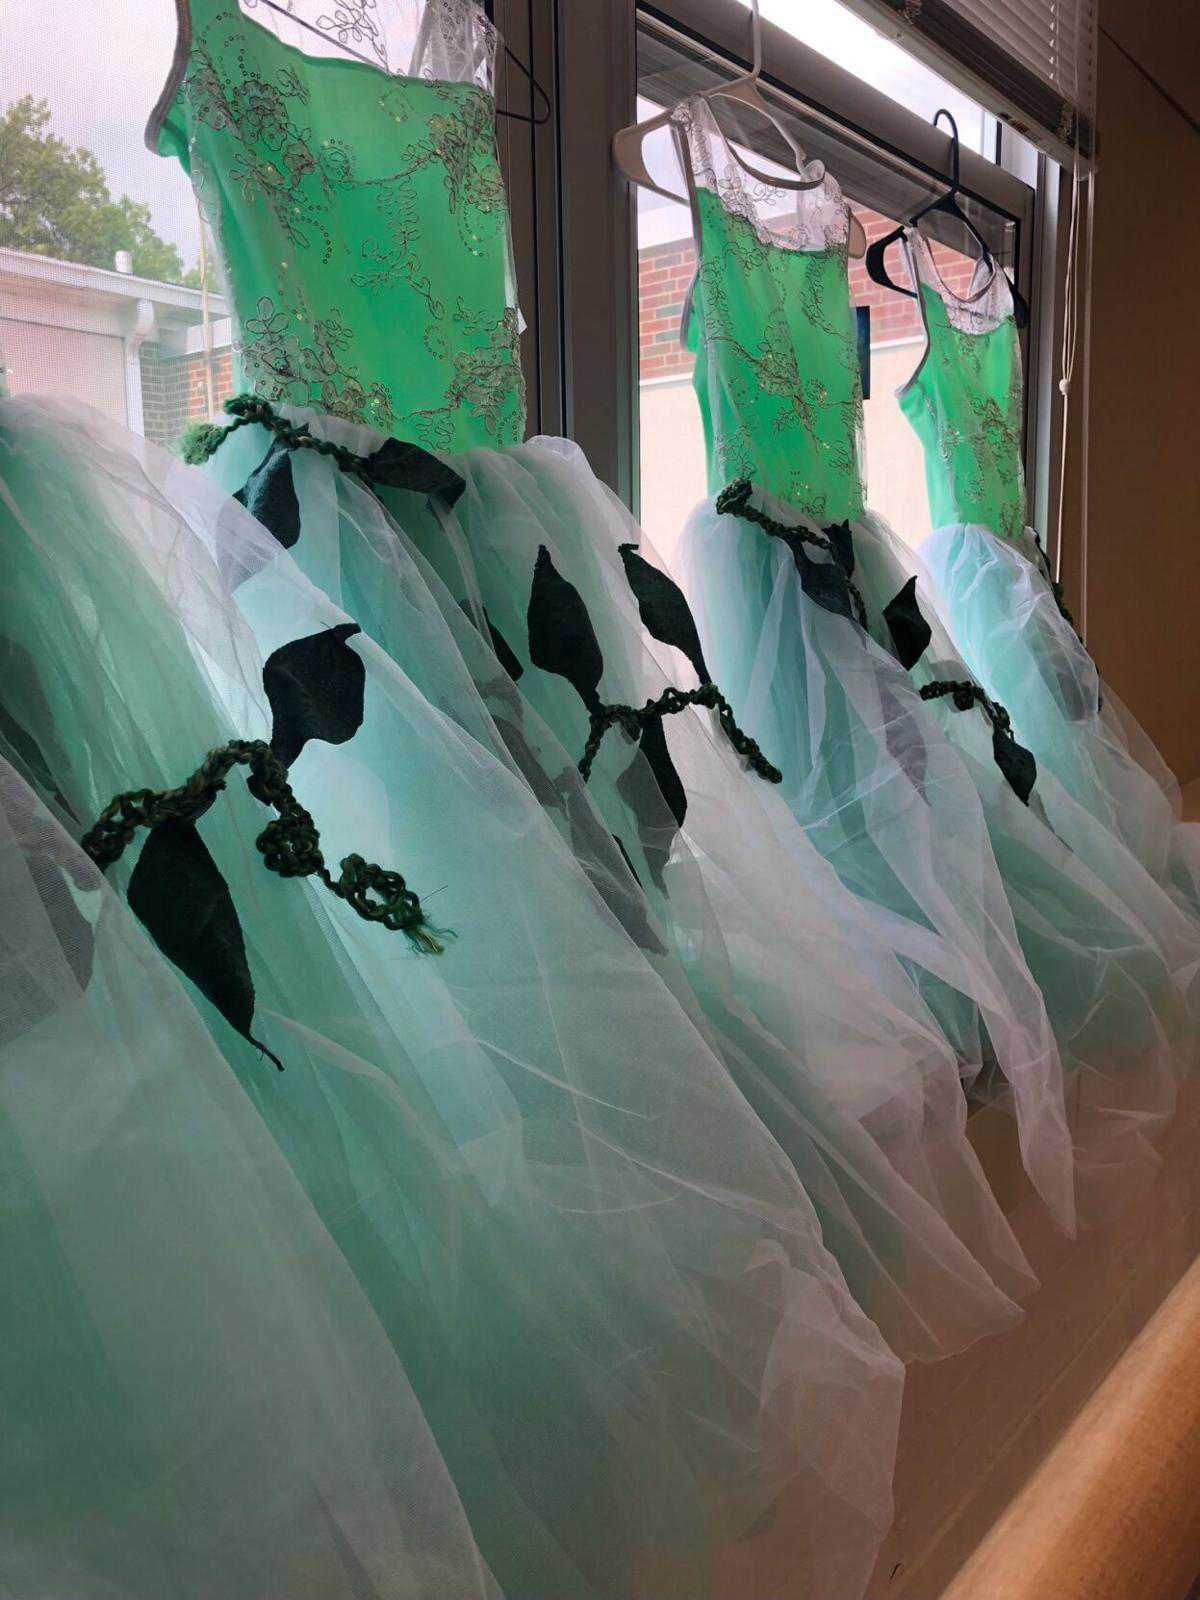 fairy costumes7.16.21.jpeg